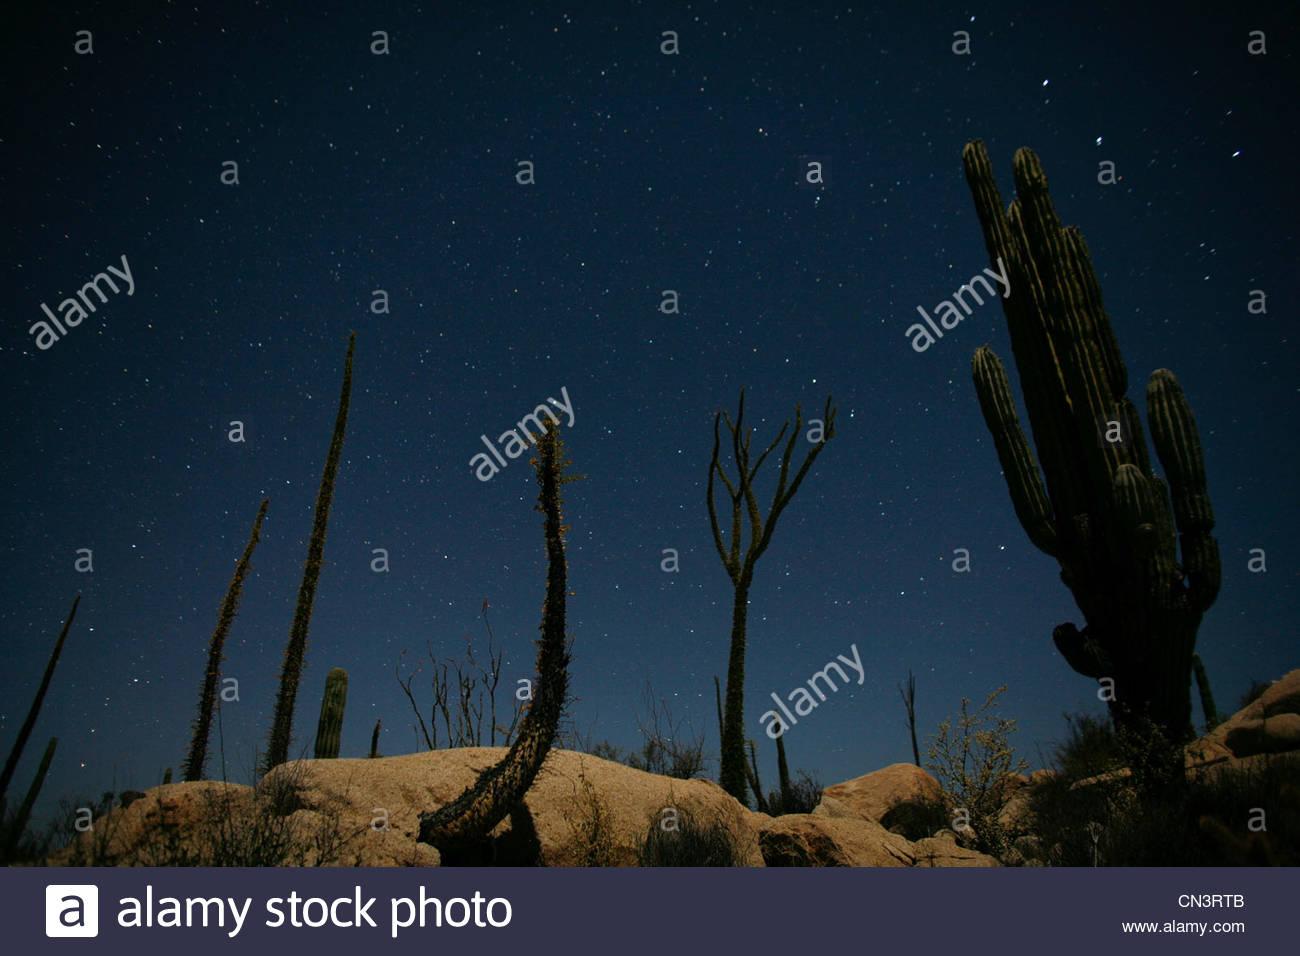 Night sky, Catavina Desert, Baja Peninsula, Mexico - Stock Image